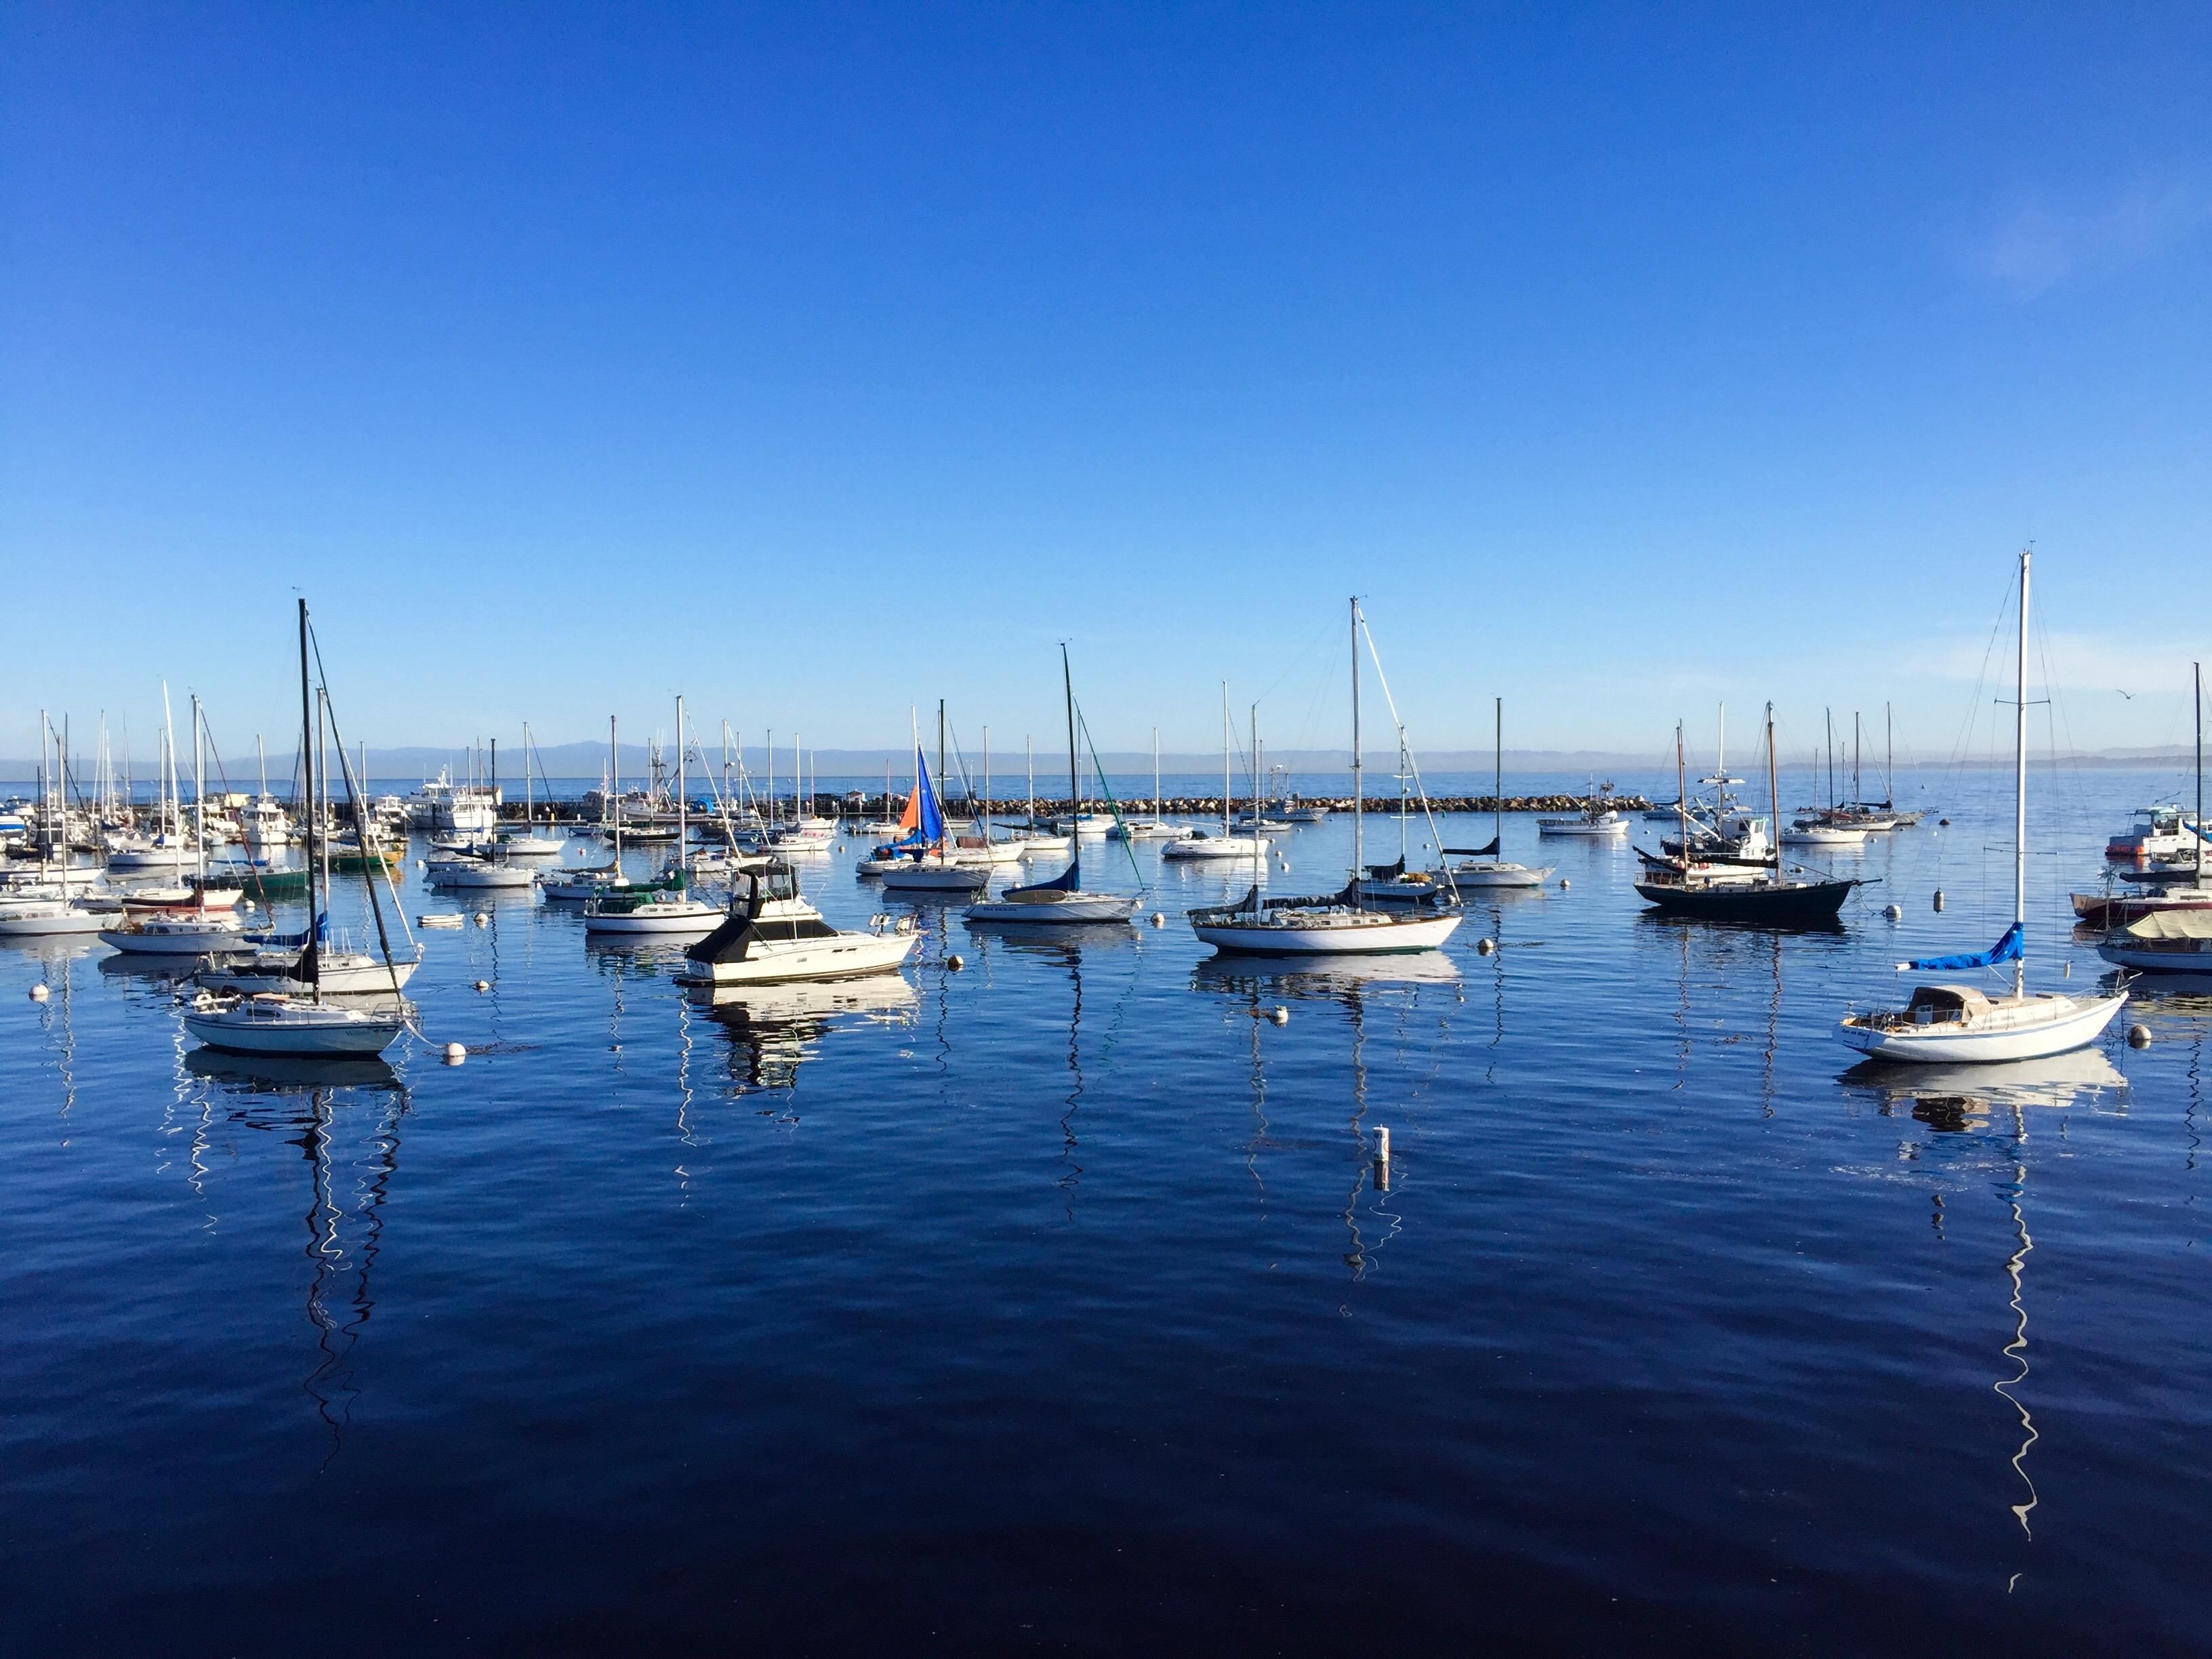 Monterey Fishermans Wharf.jpg (1.65 MB)